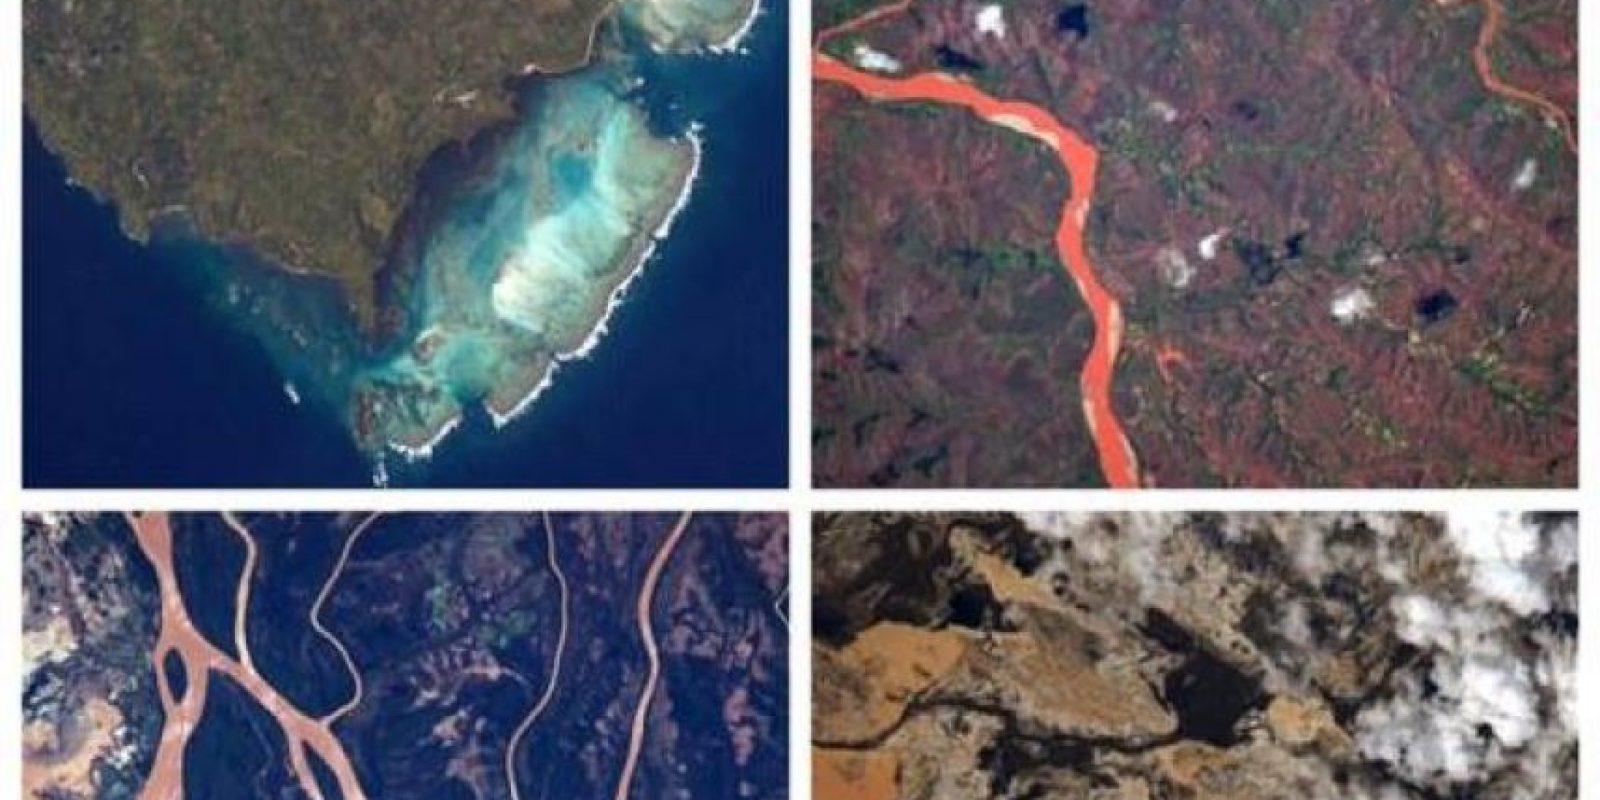 La diversidad de colores de Madagascar Foto:Facebook.com/pages/NASA-Astronaut-Scott-Kelly